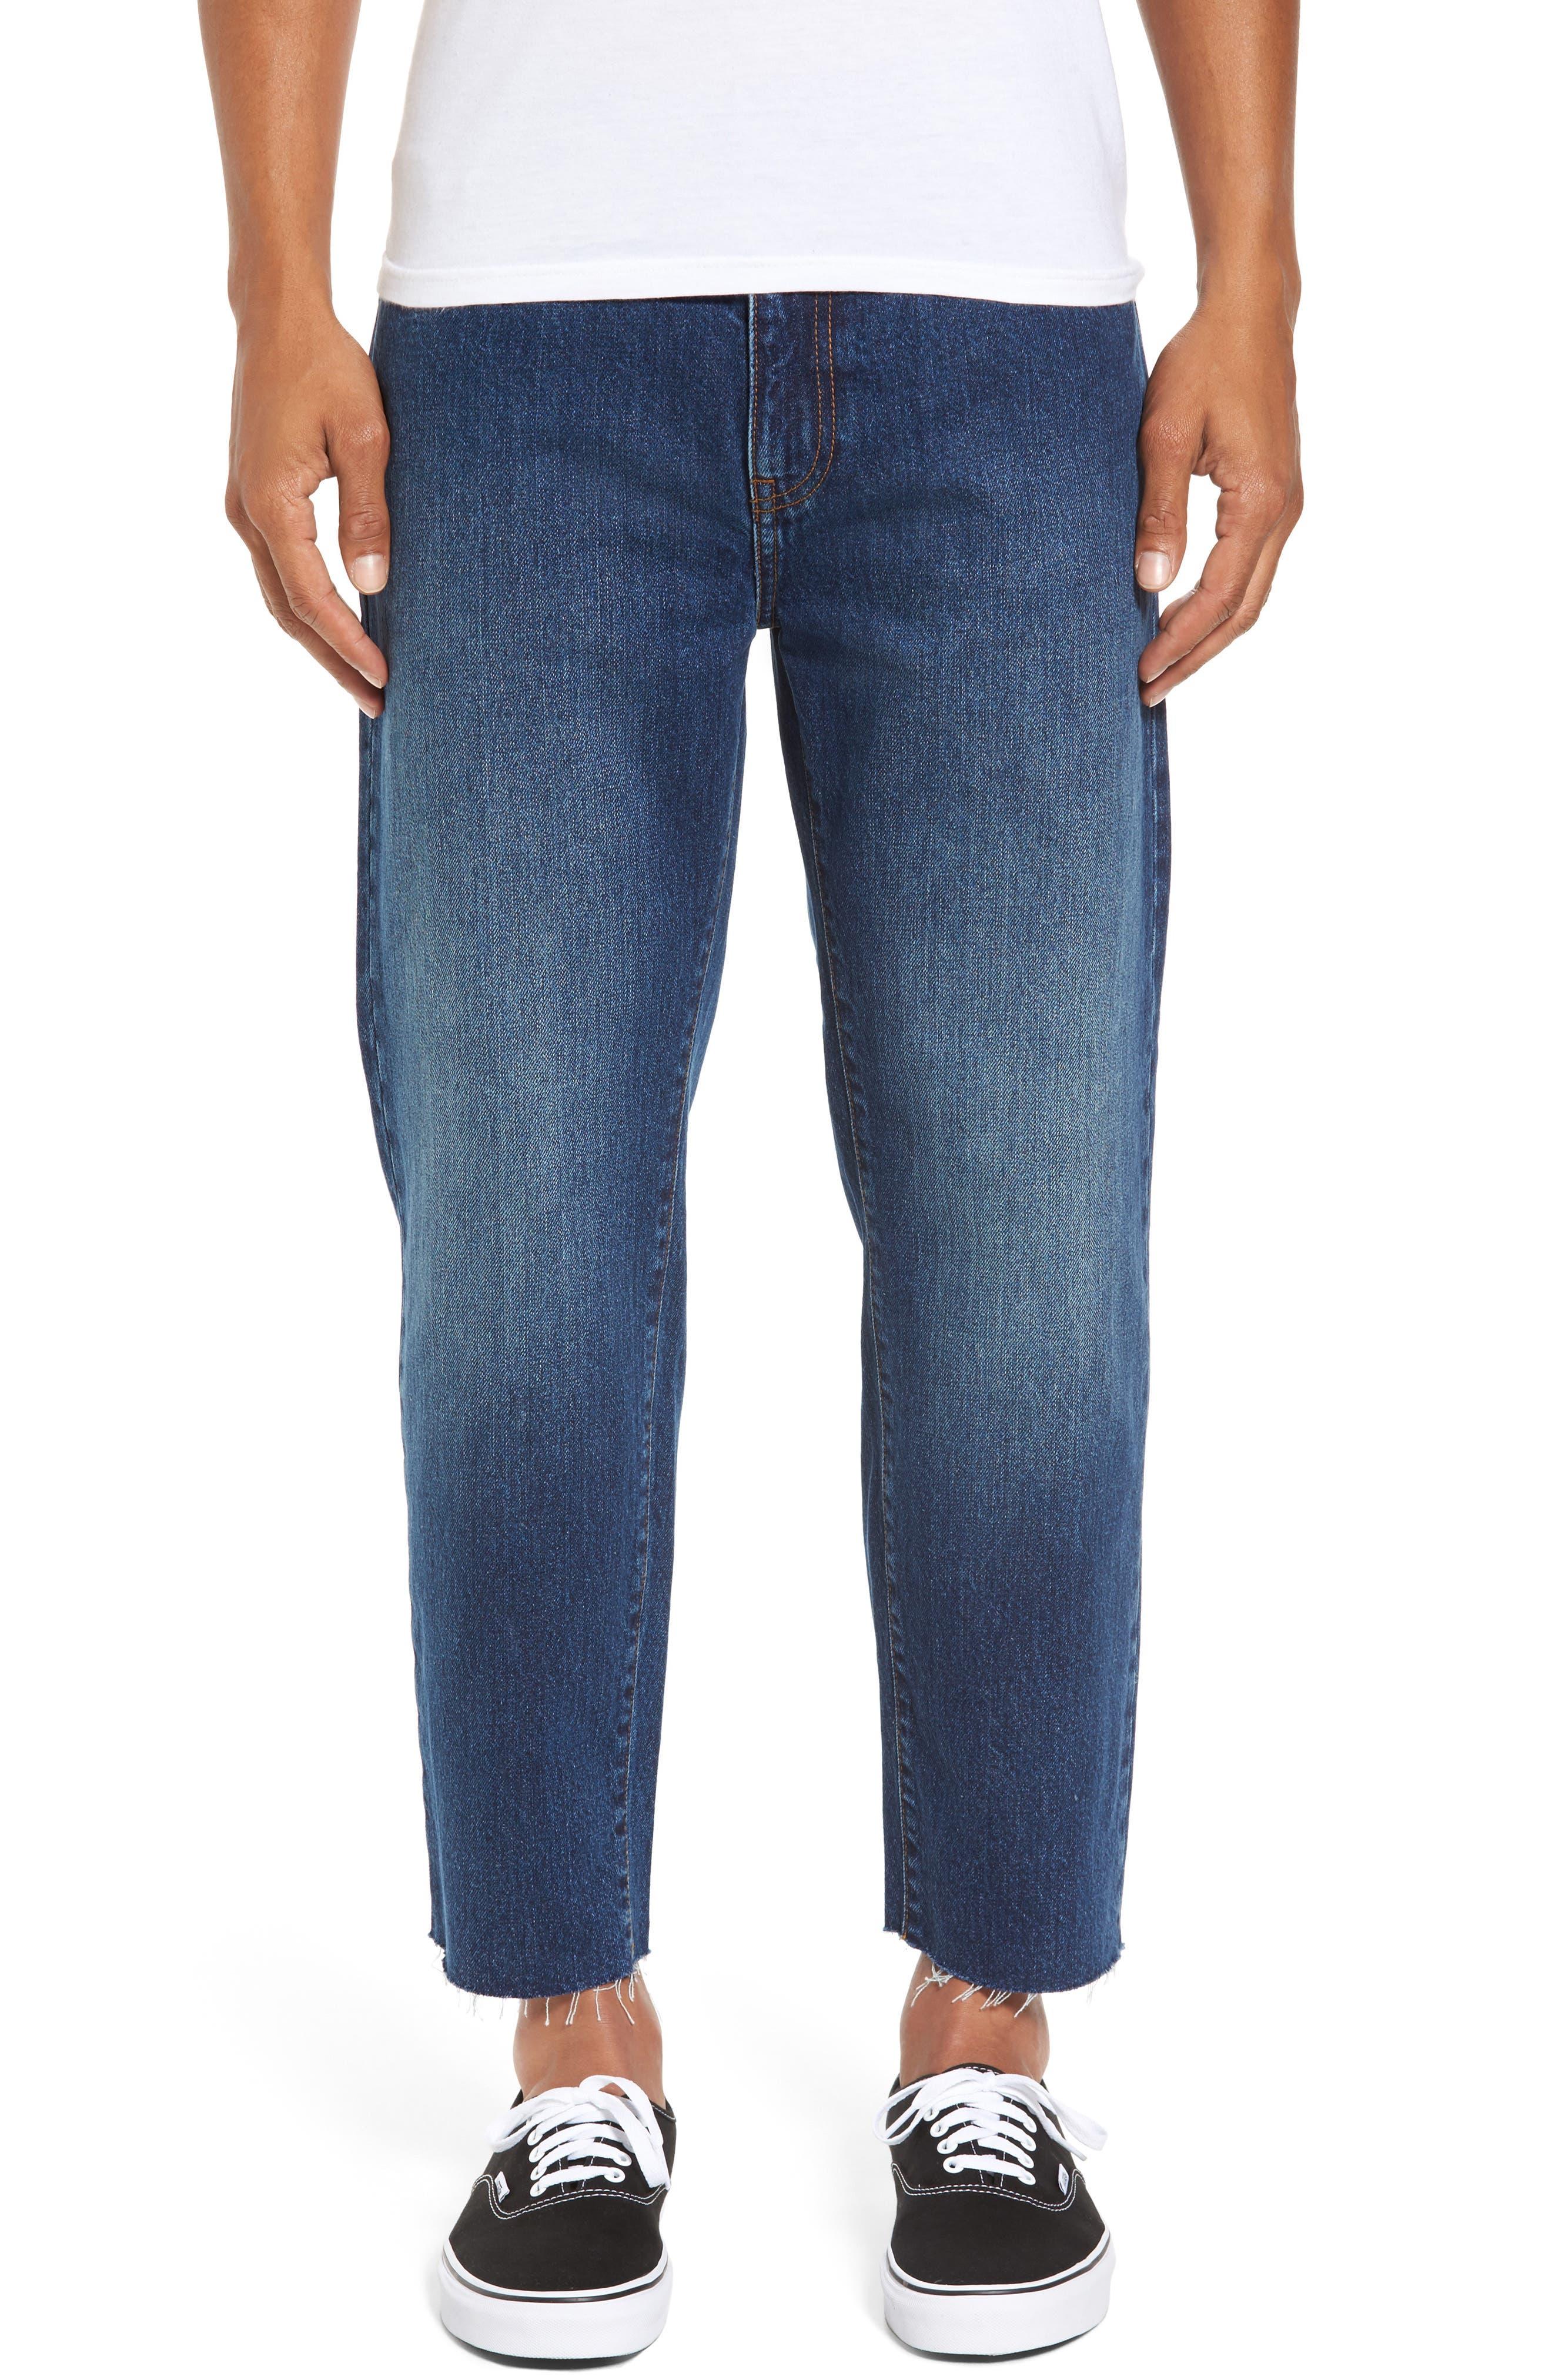 Otis Straight Fit Crop Jeans,                             Main thumbnail 1, color,                             Worn Mid Blue Raw Hem